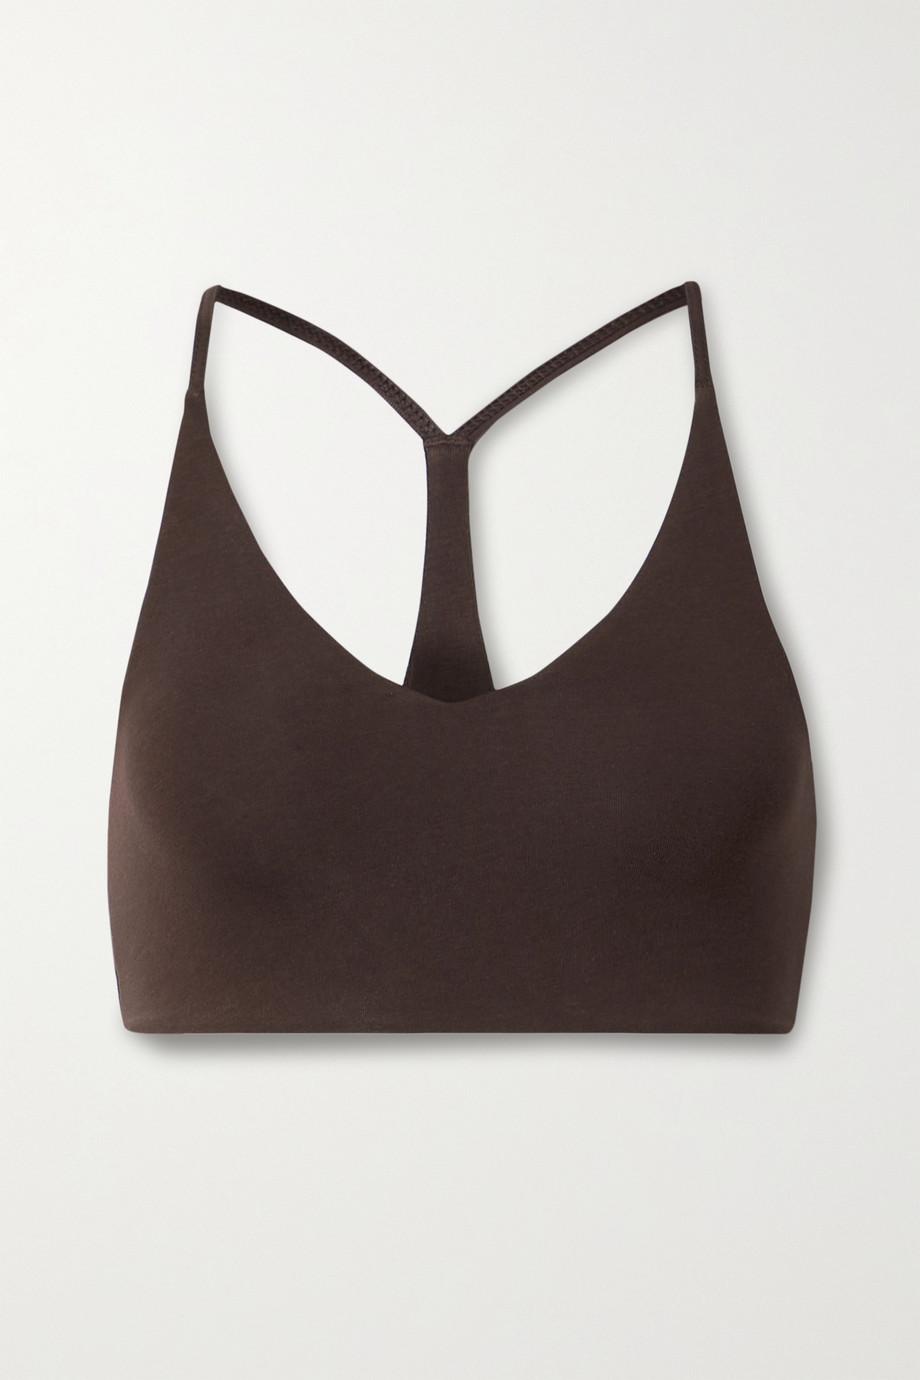 Skin + NET SUSTAIN Ora stretch organic Pima cotton-jersey soft-cup bra